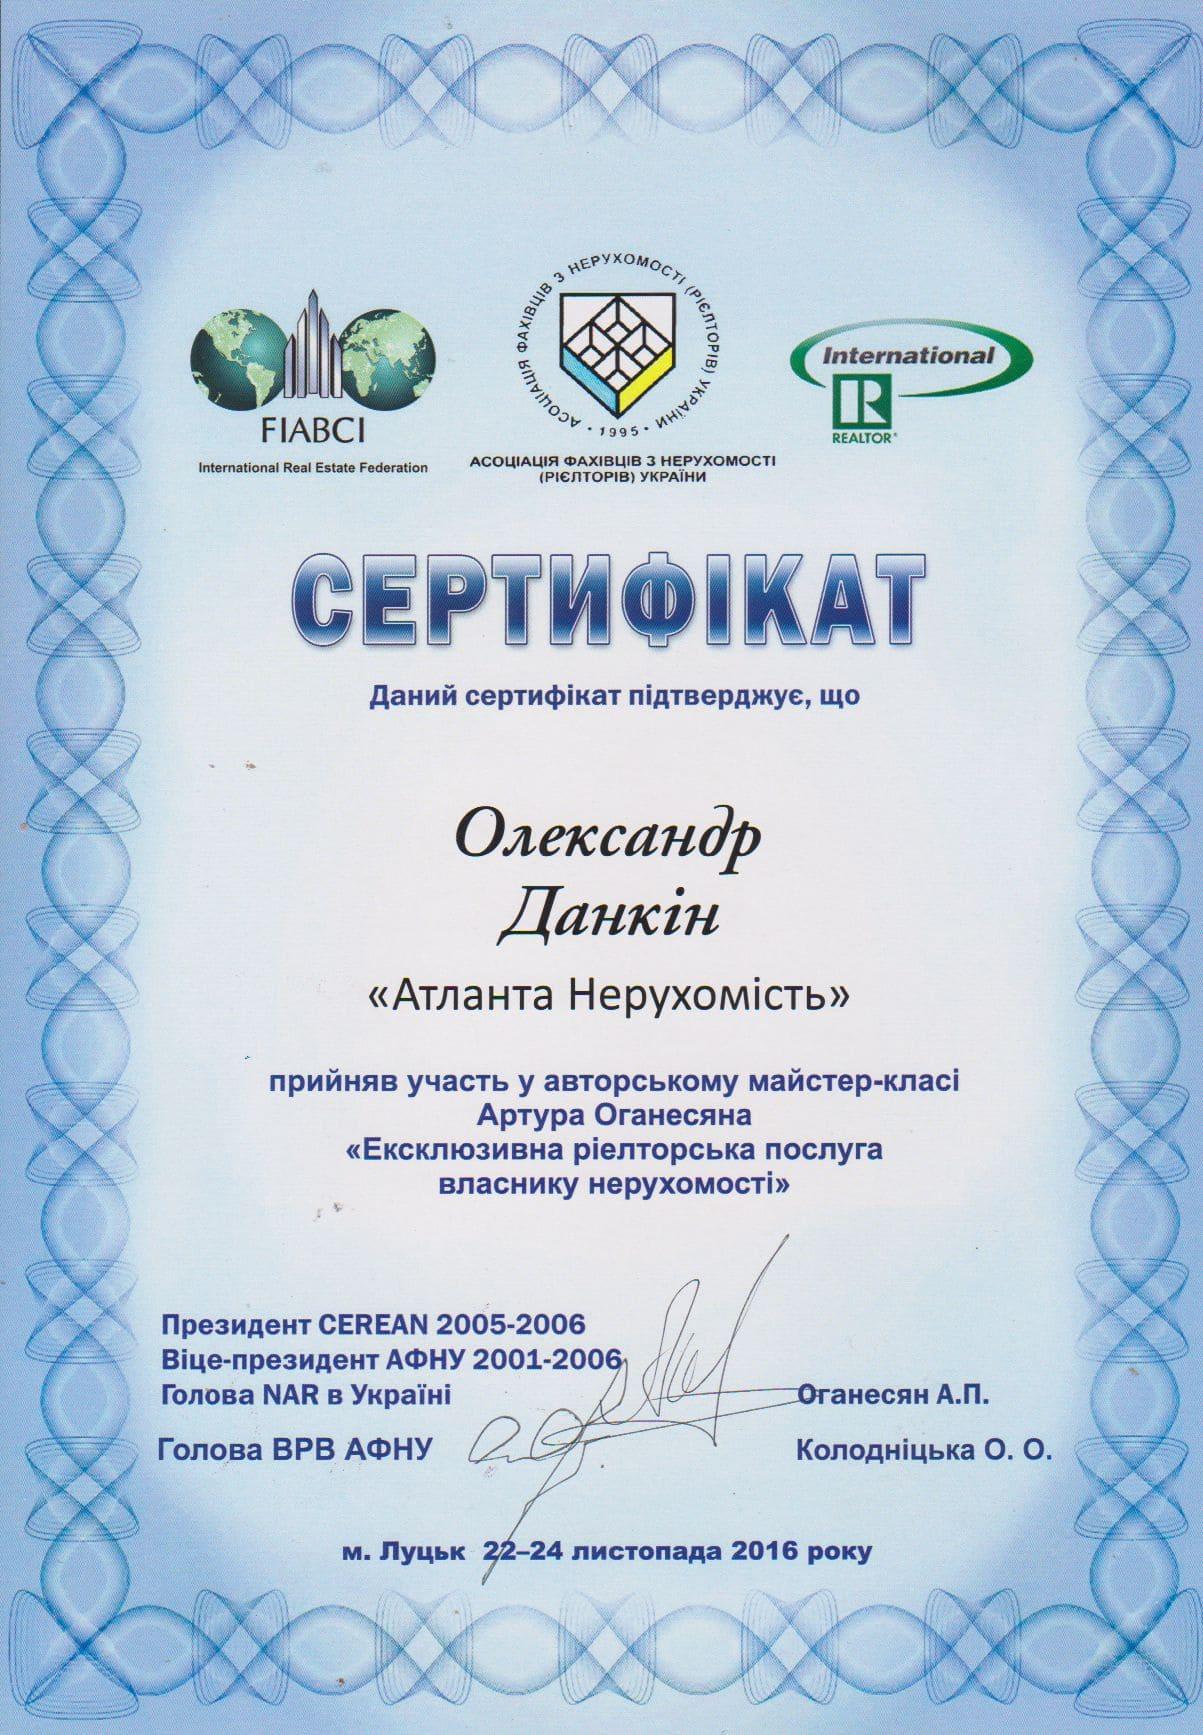 Сертифікат ВКН (14)